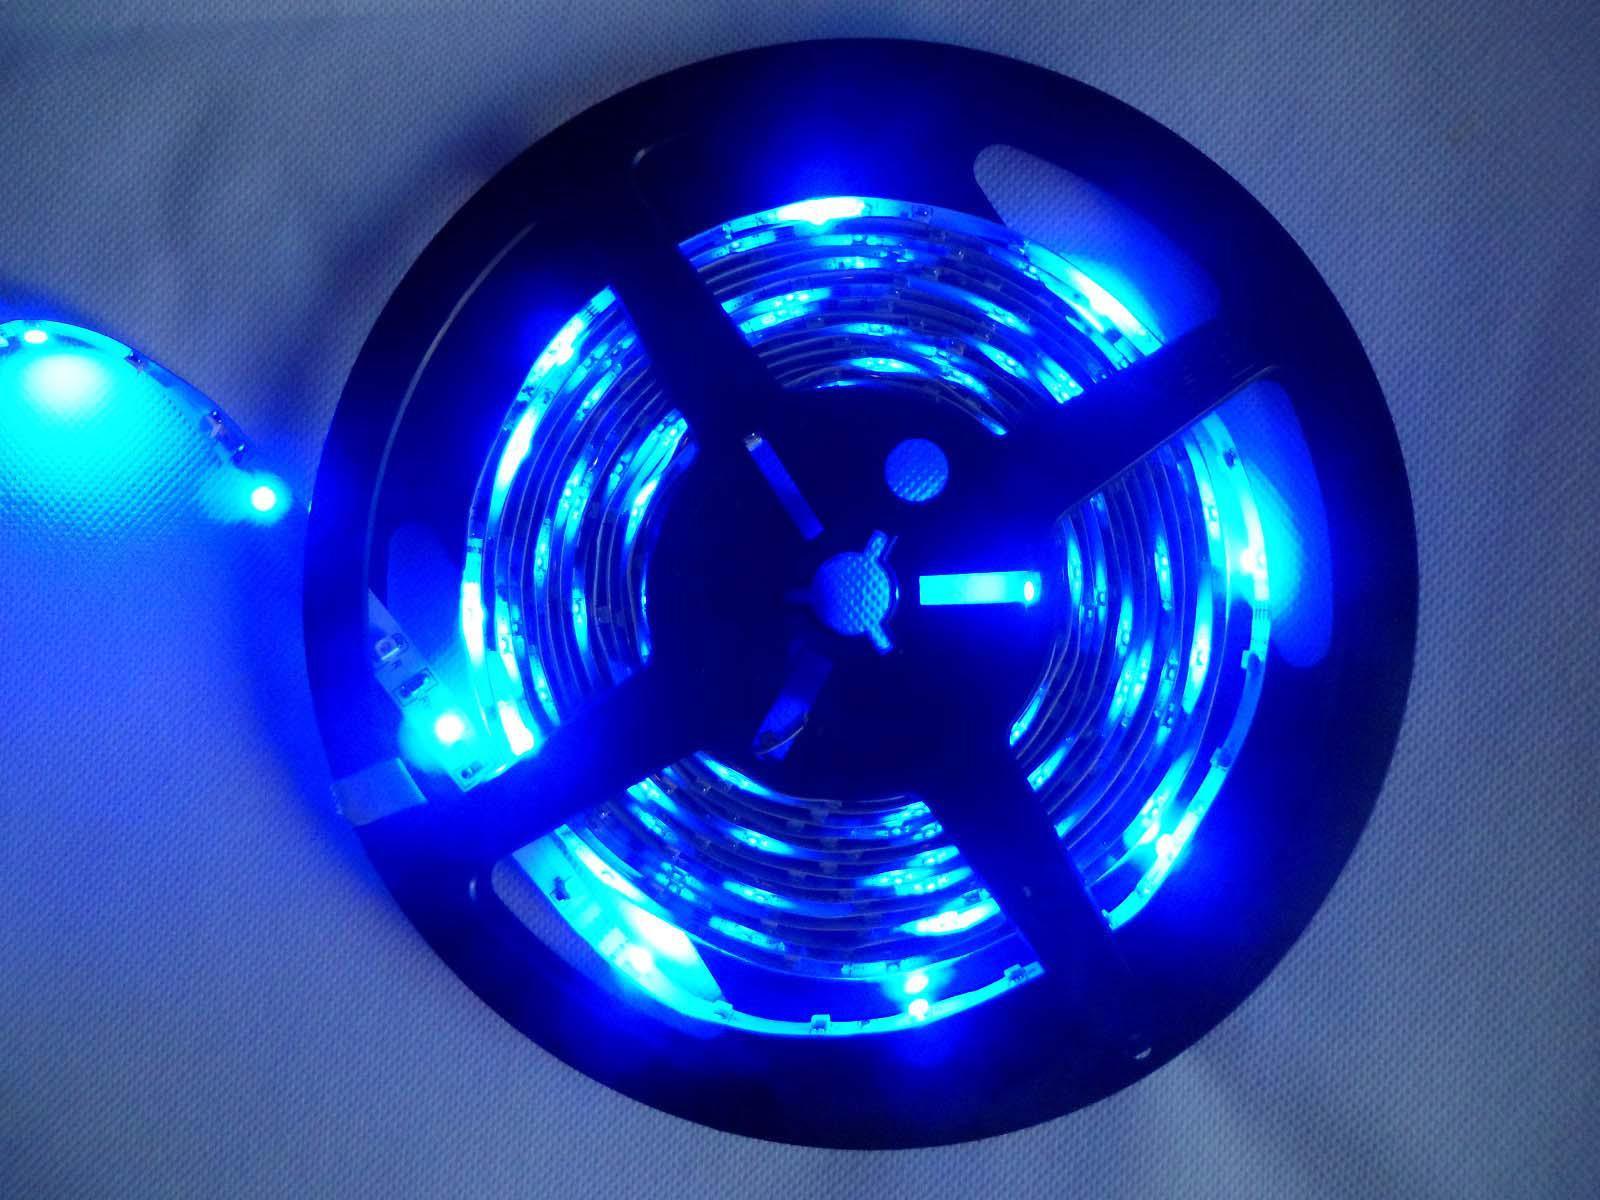 5M RGB 3528 Flexible impermeable 300 Led Tira de luz +24 Teclas IR remoto + UE EE. UU. Reino Unido Adaptador de corriente de enchufe